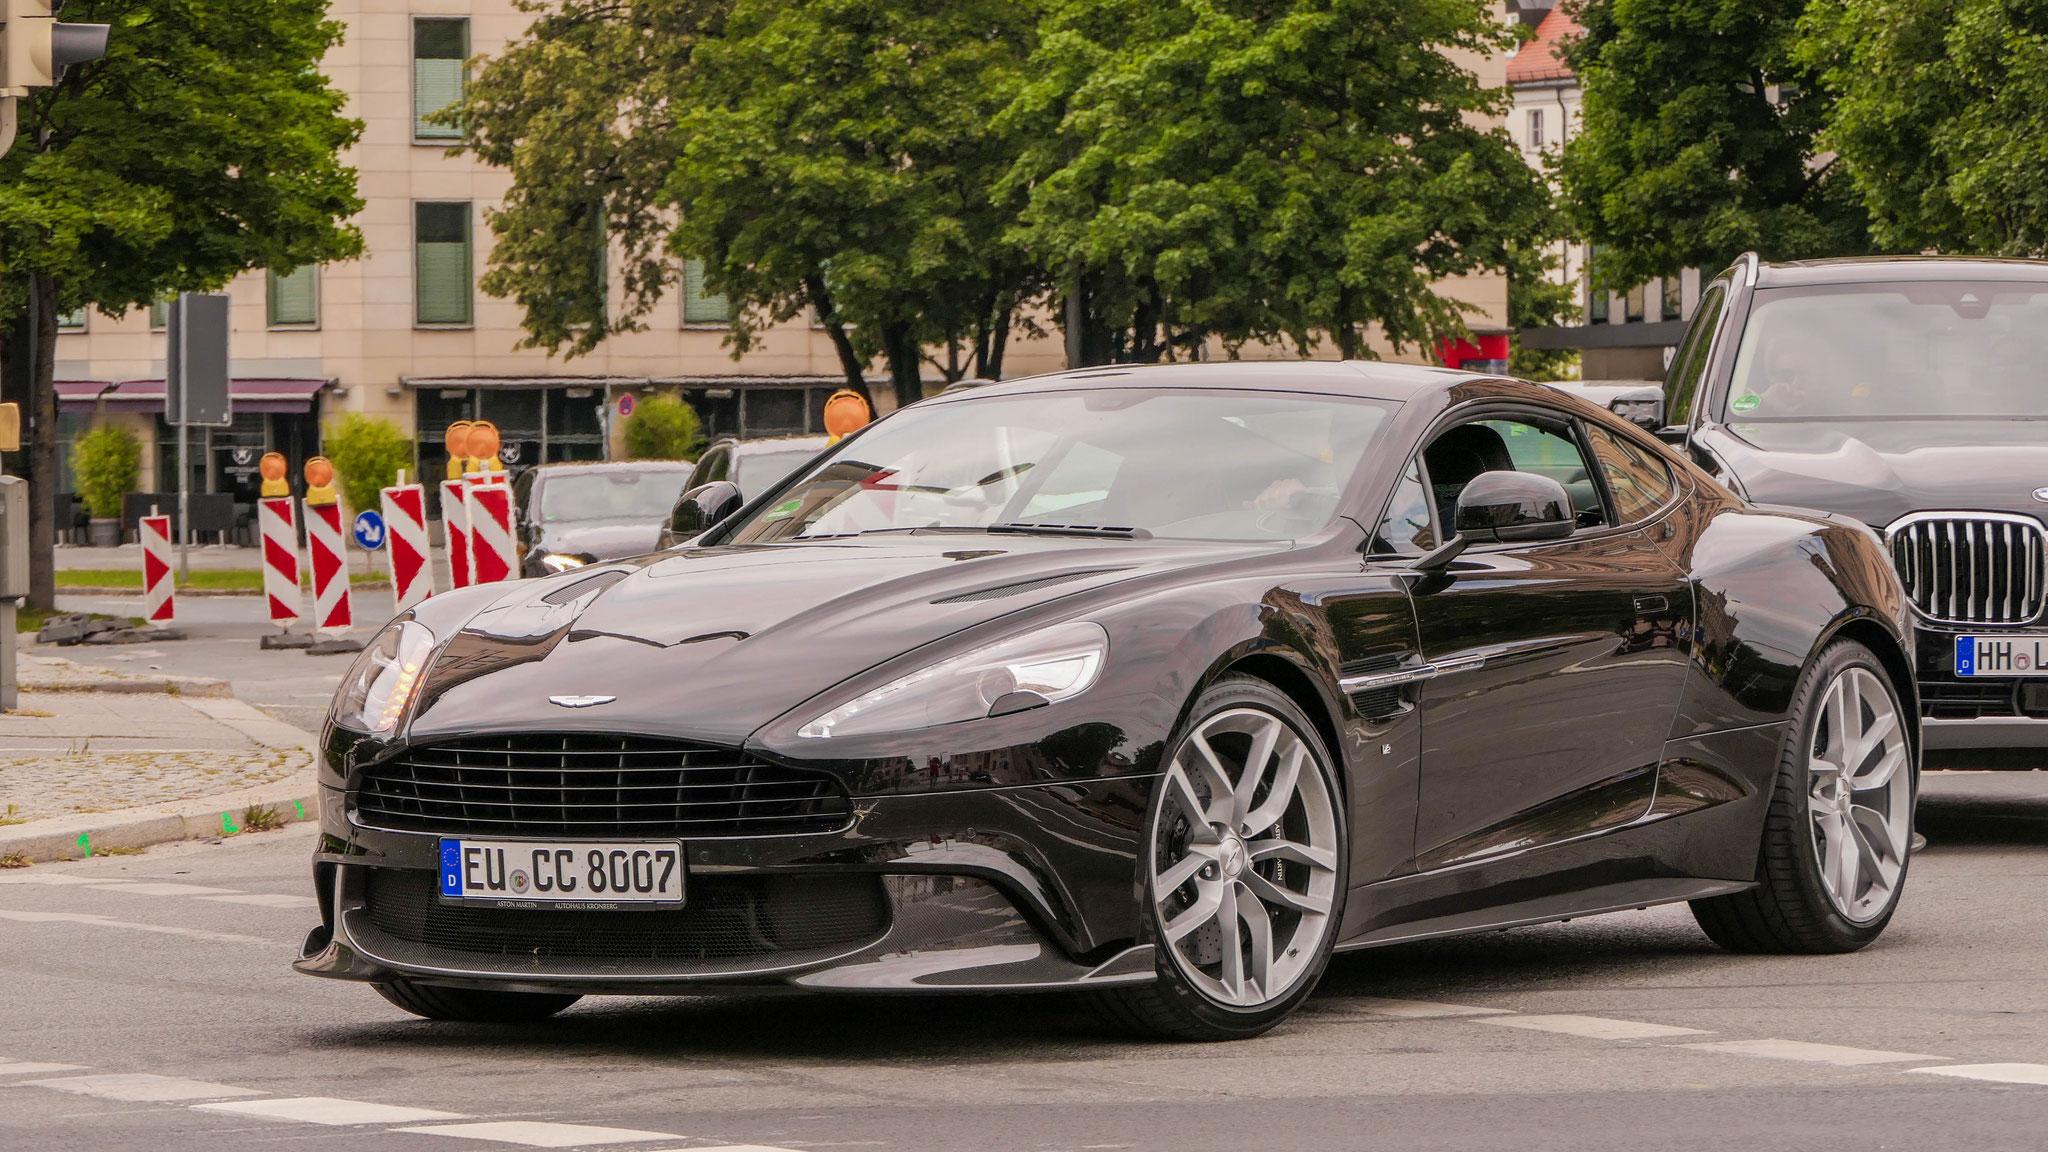 Aston Martin Vanquish S - EU-CC-8007